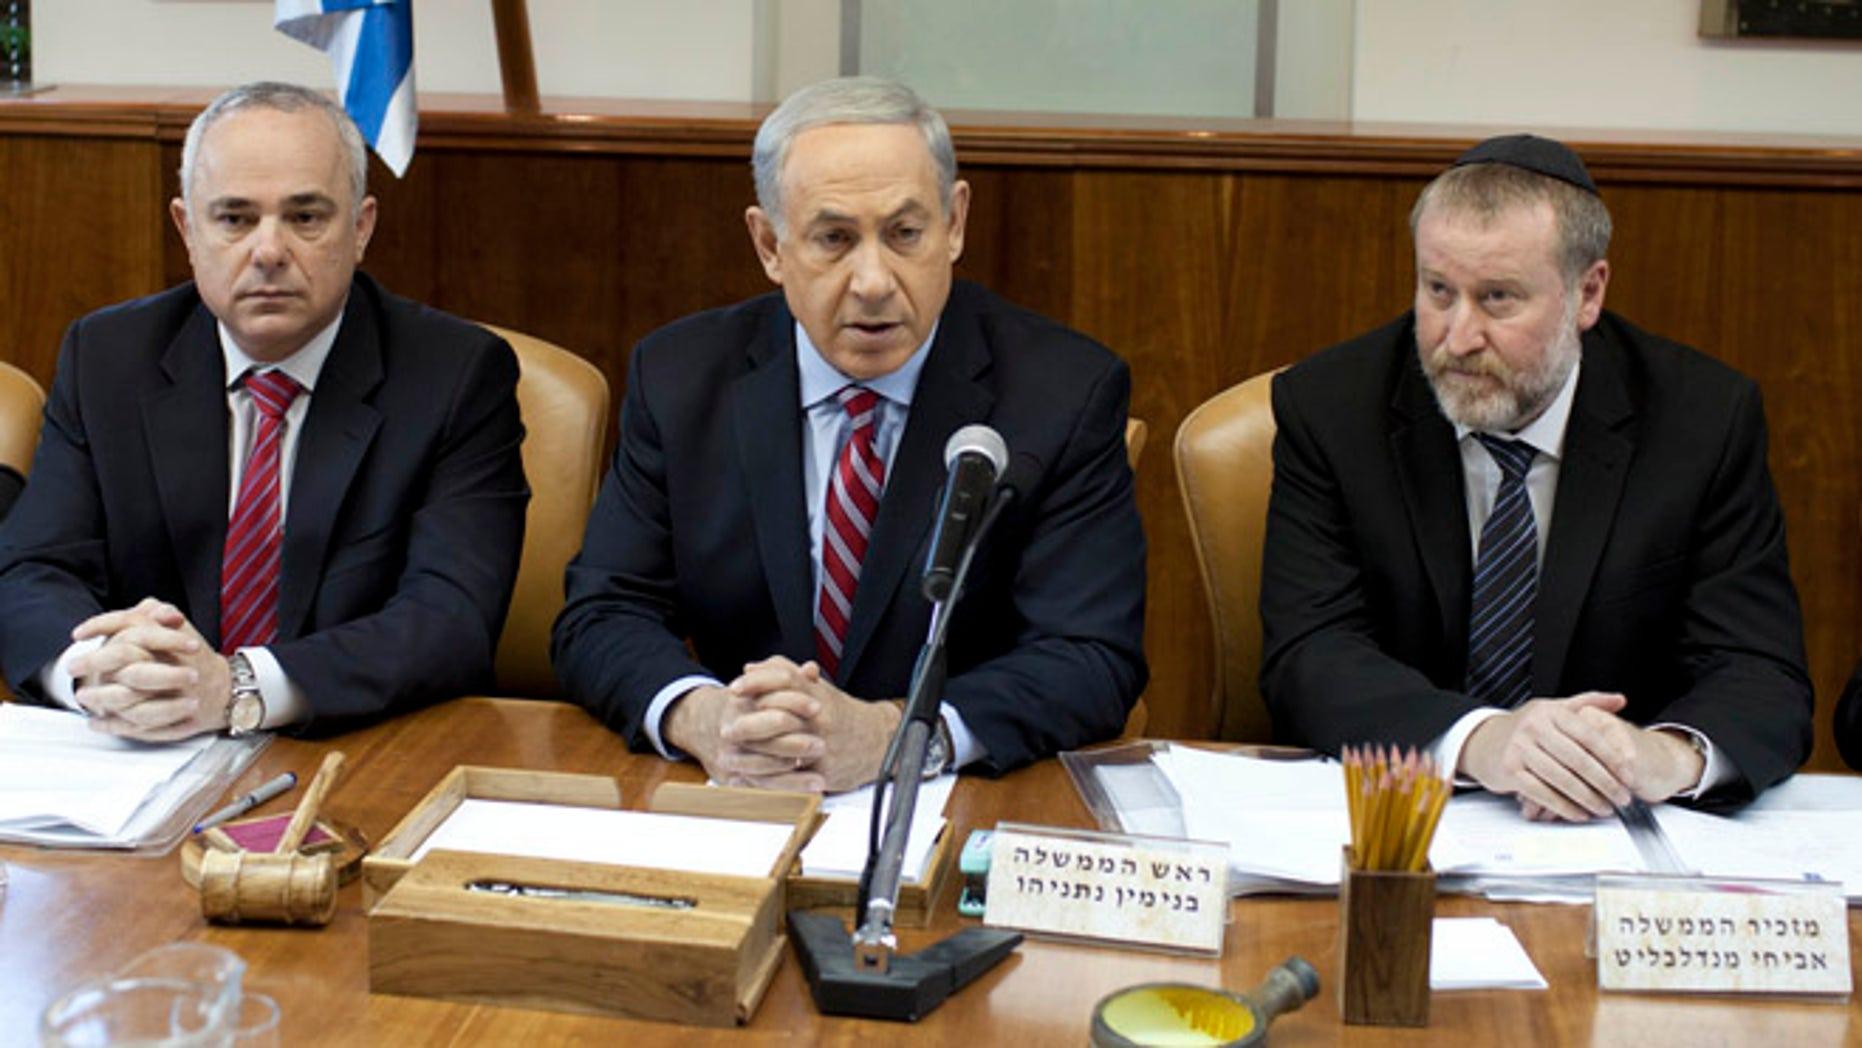 Nov. 24, 2013: Israeli Prime Minister Benjamin Netanyahu, center, attends the weekly cabinet meeting at his office in Jerusalem, Israel.